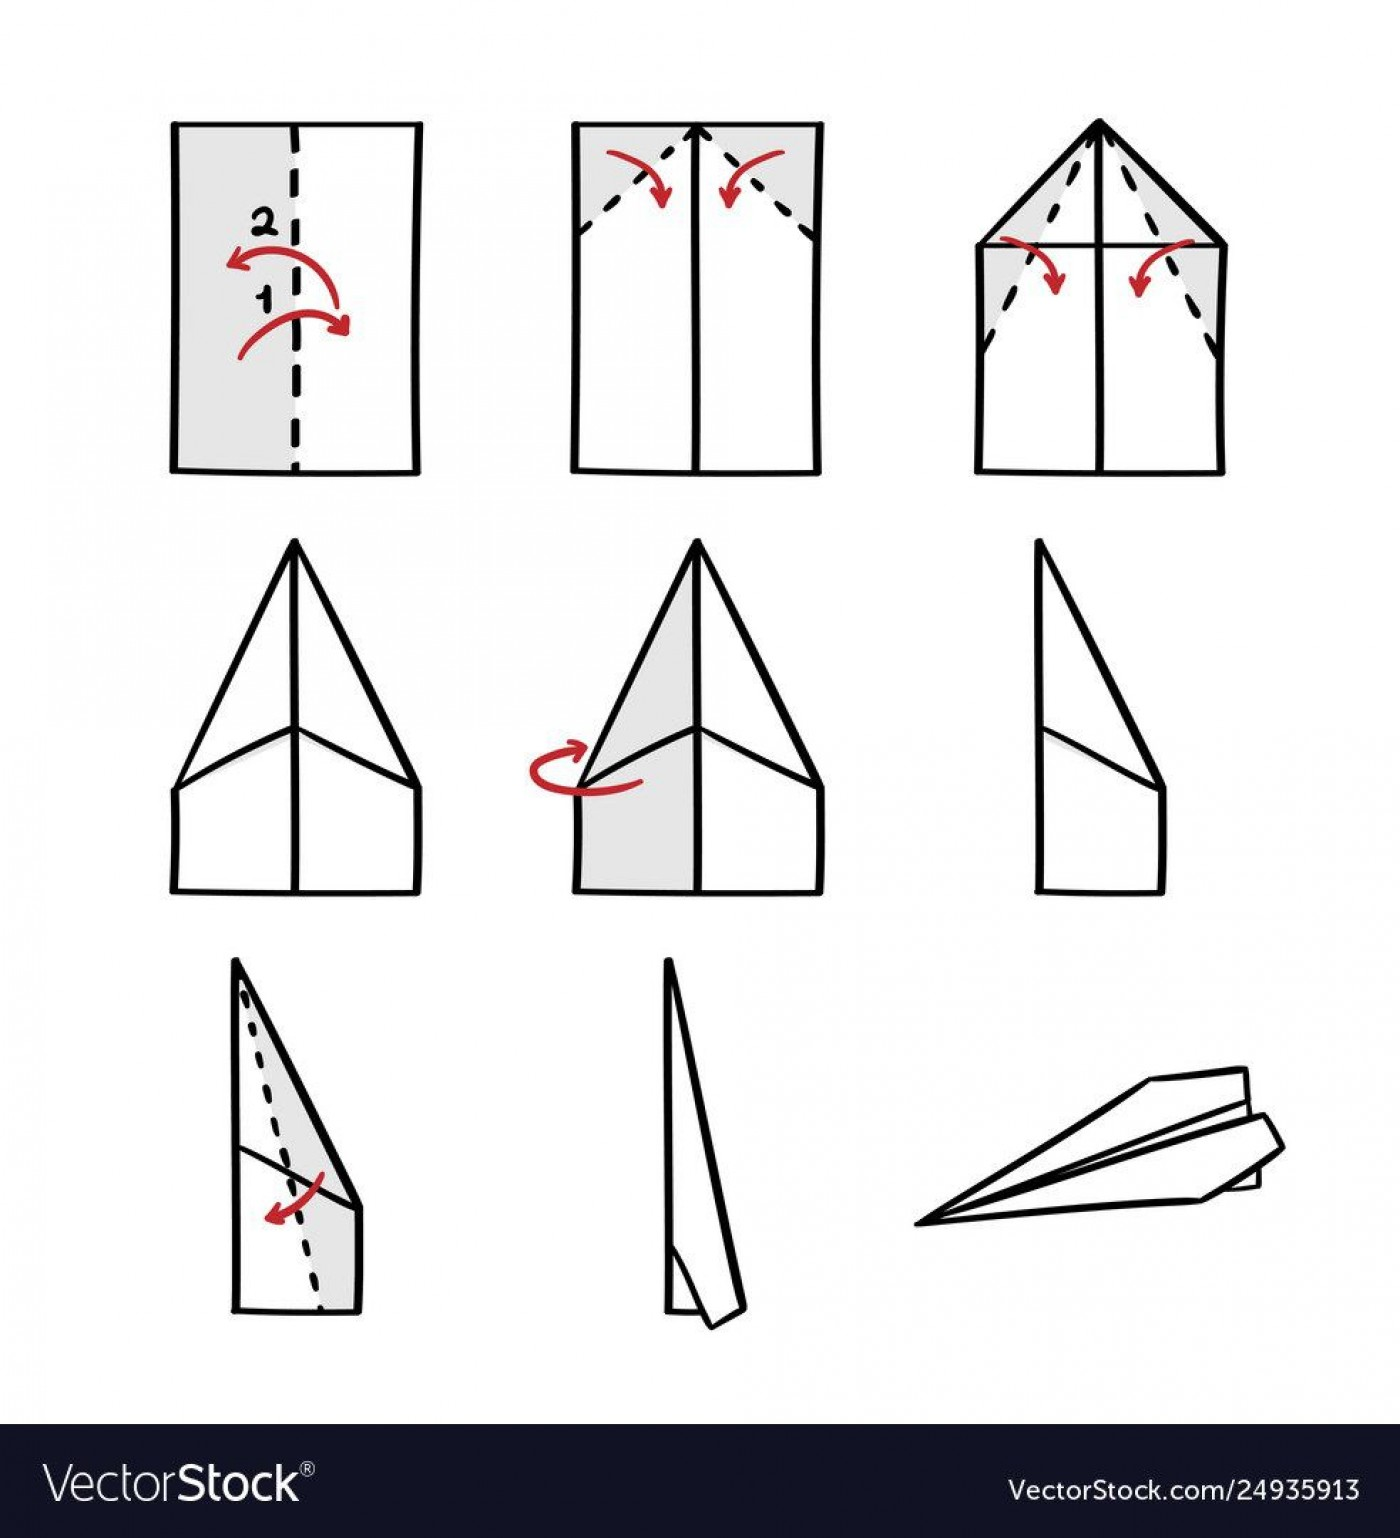 008 Impressive Printable Paper Airplane Folding Instruction High Resolution 1400